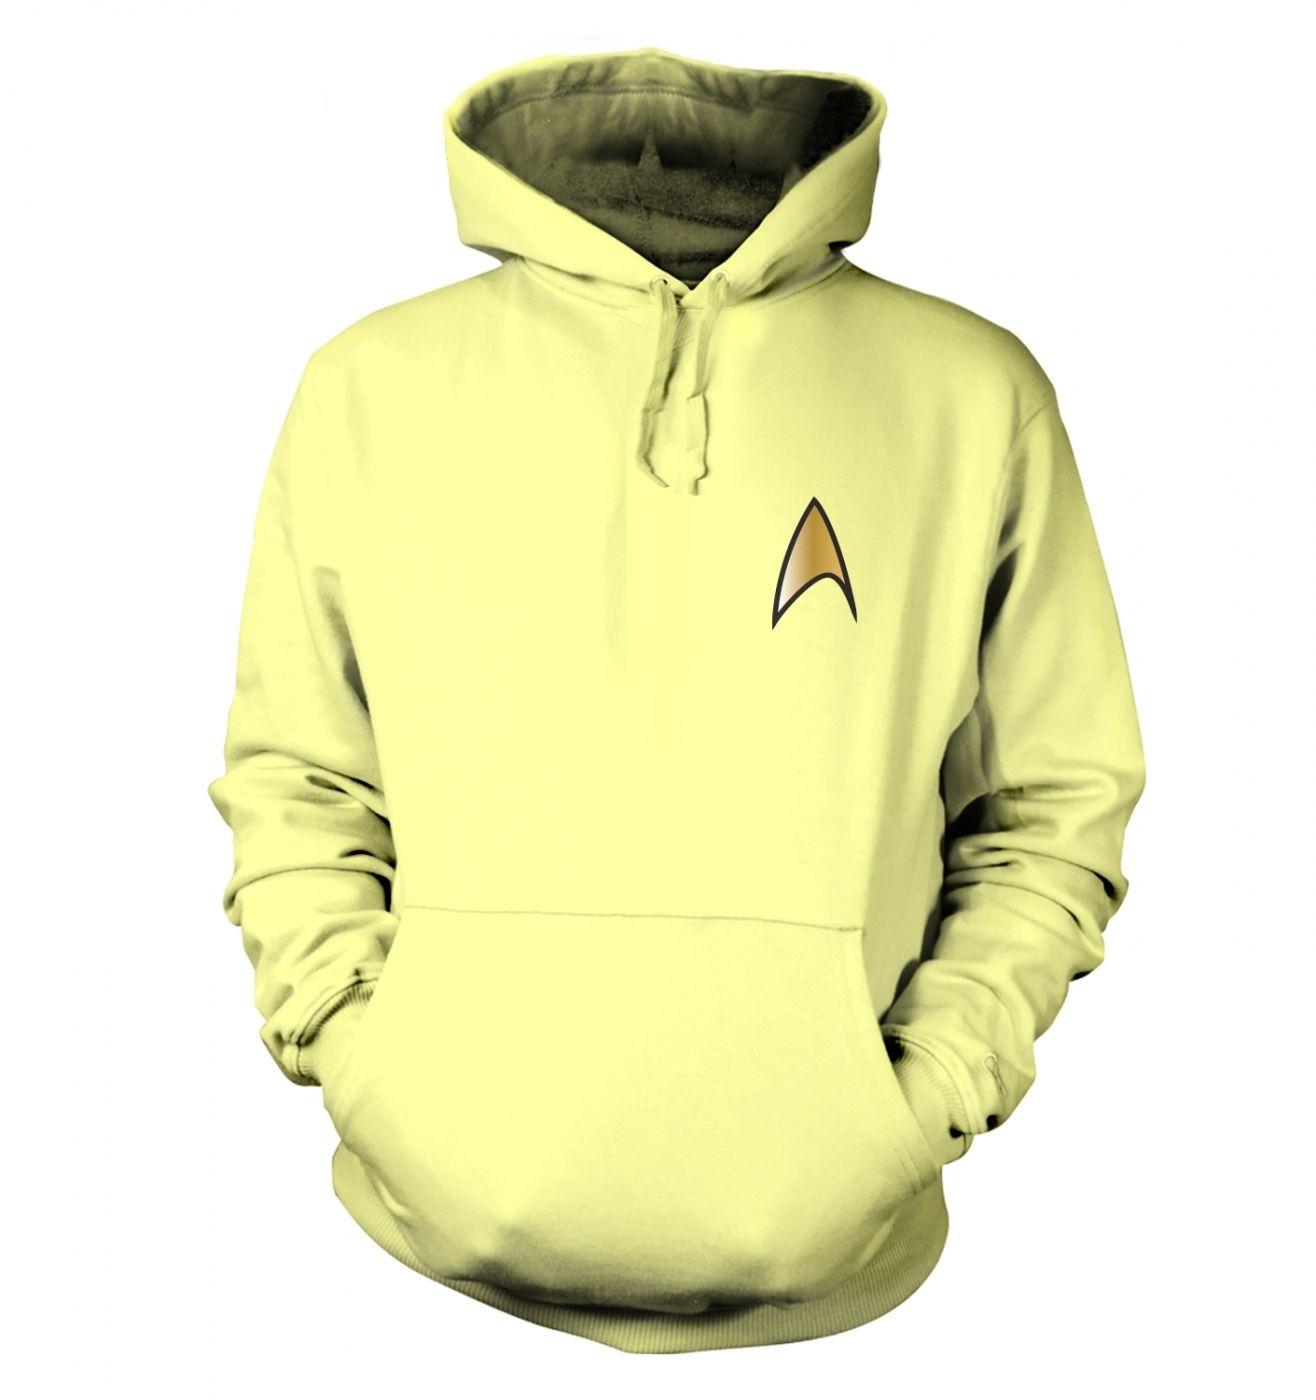 Gold Starfleet Badge hoodie